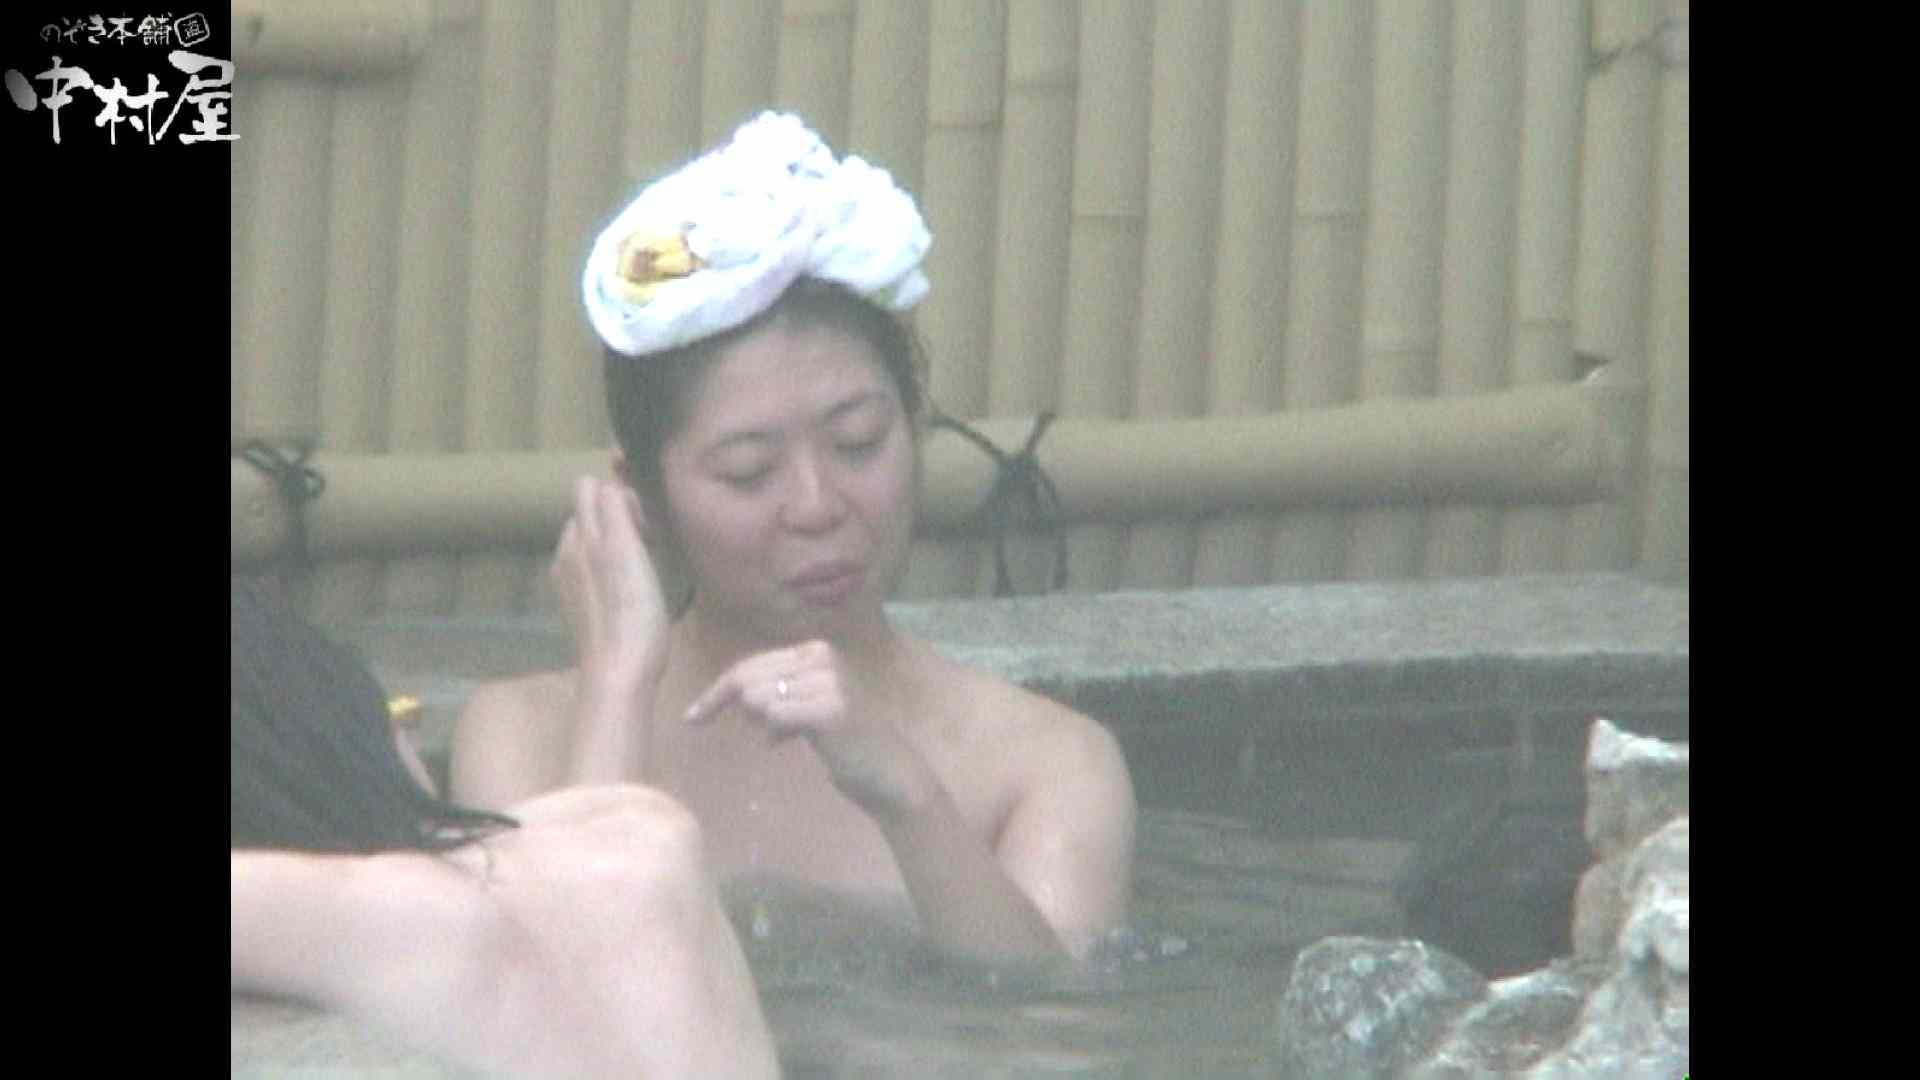 Aquaな露天風呂Vol.932 美しいOLの裸体 おまんこ無修正動画無料 106pic 44